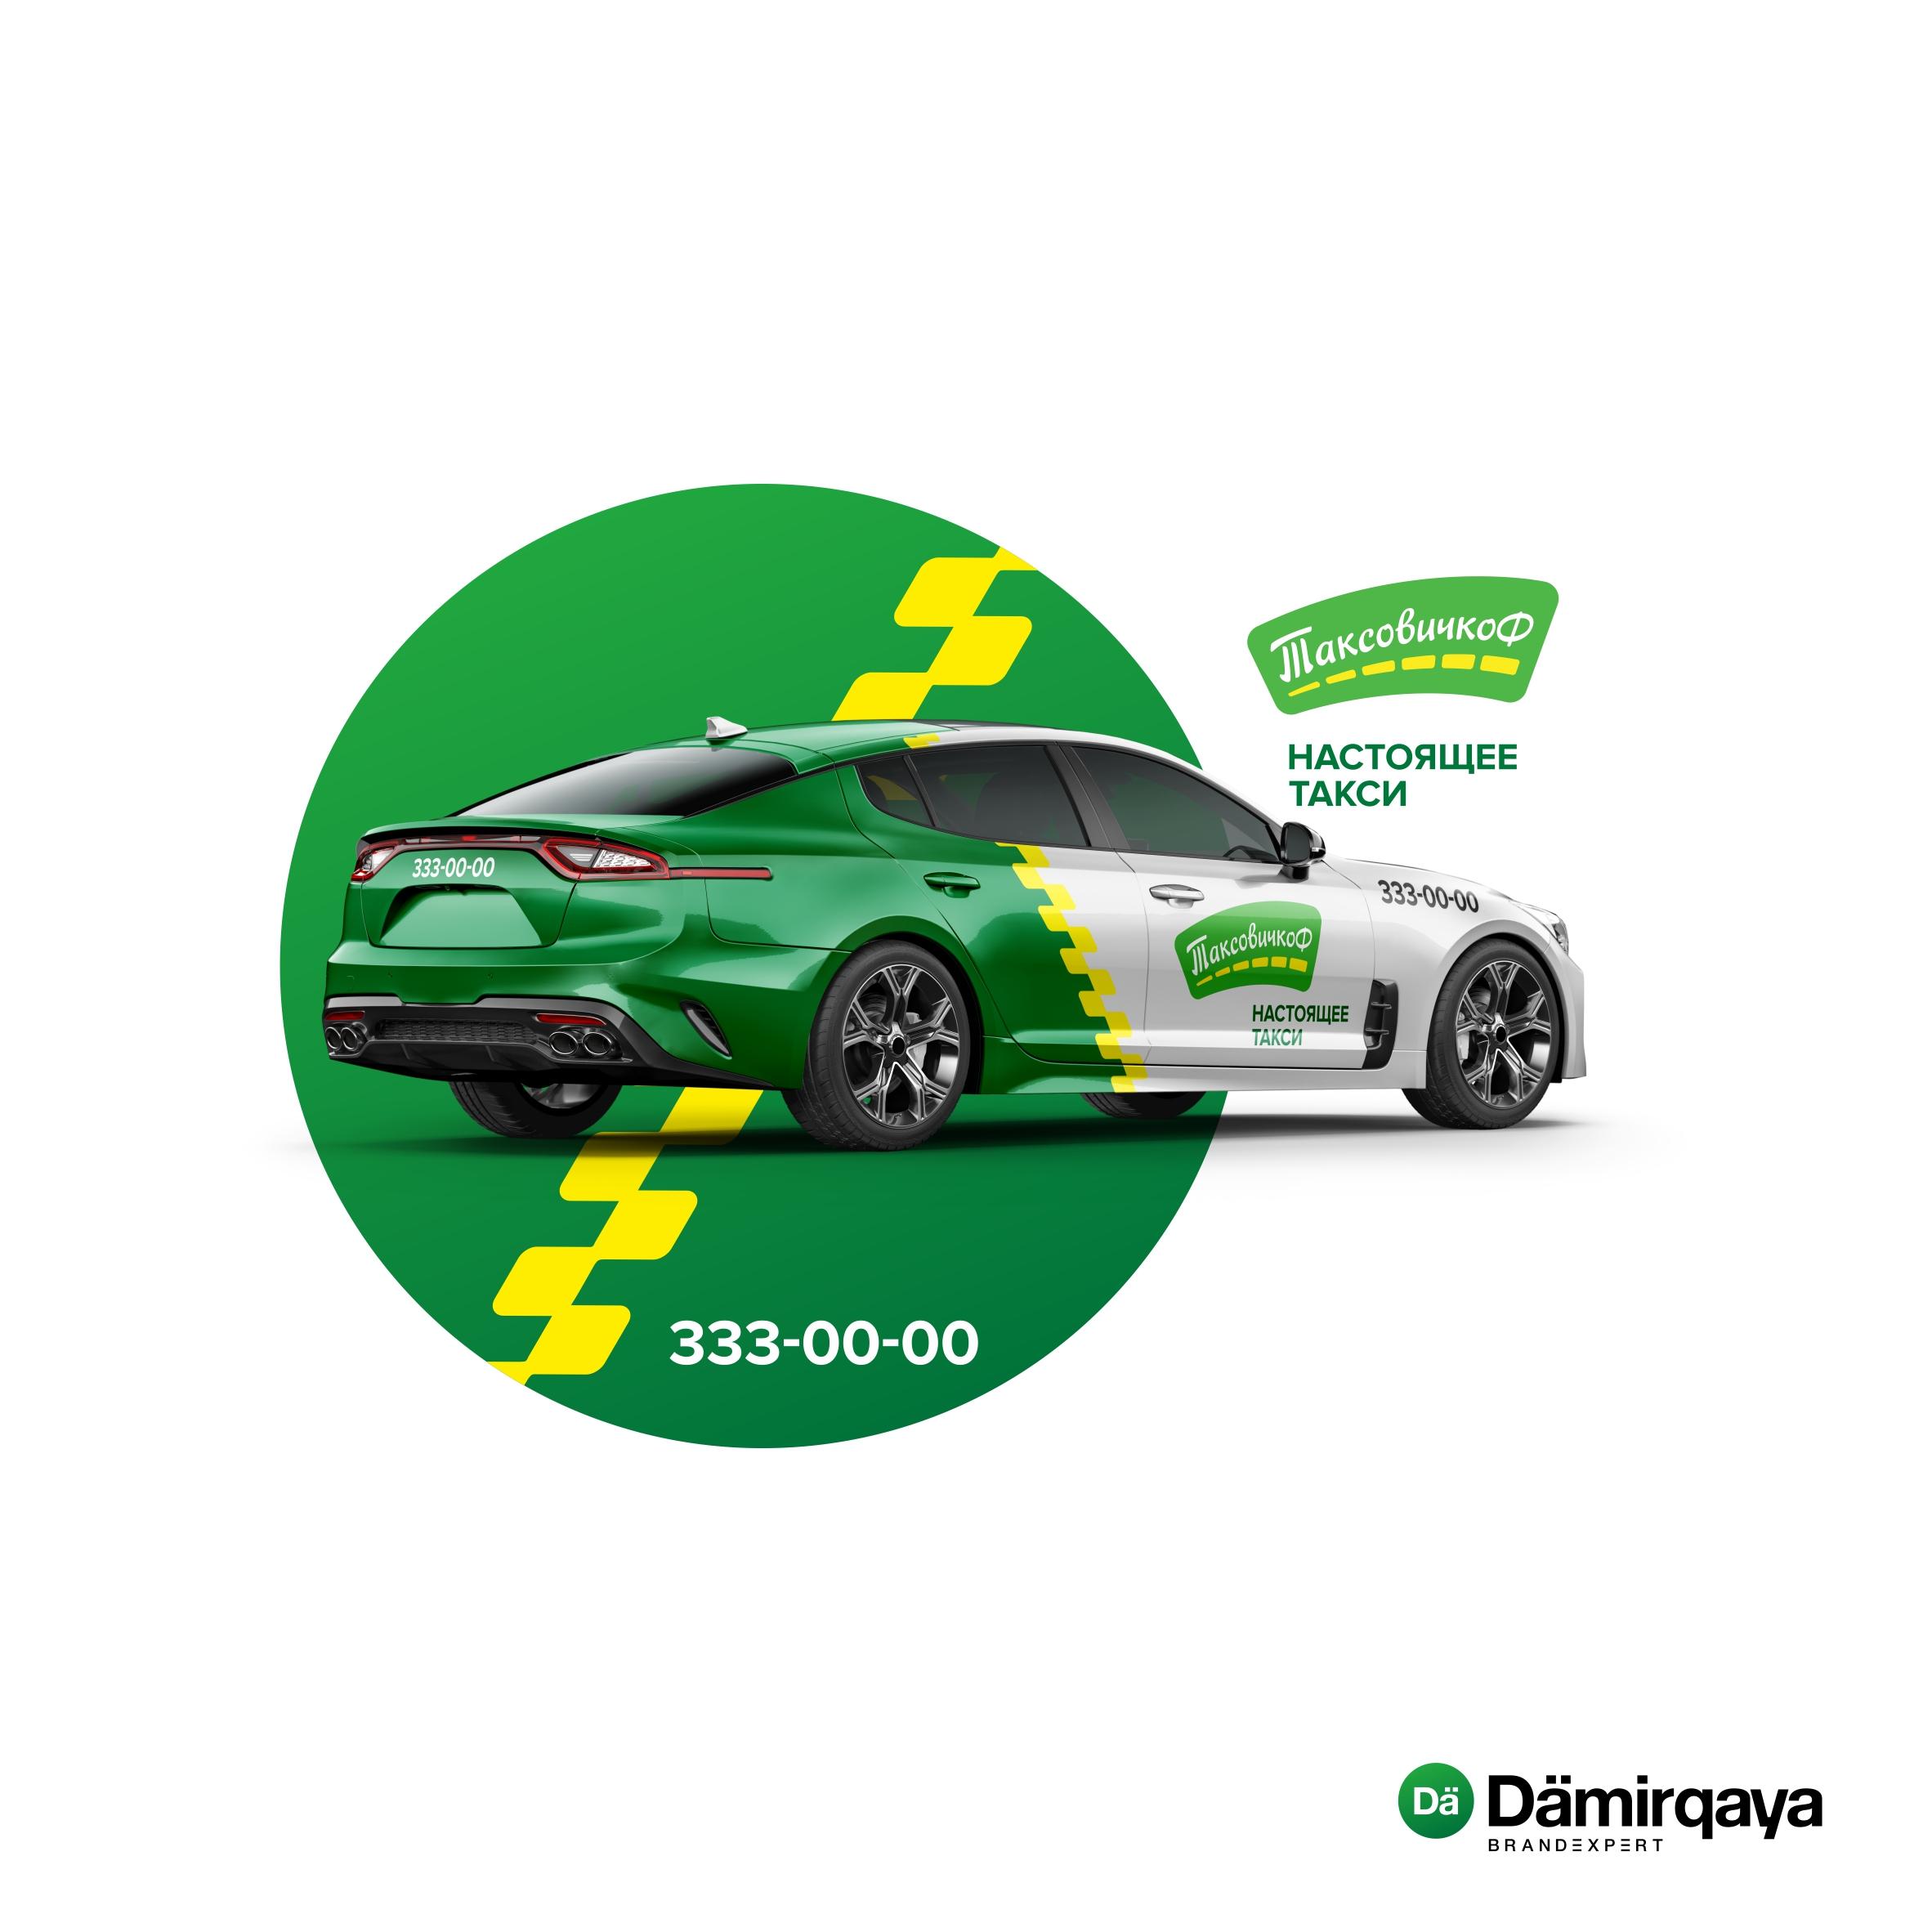 Разработка брендирования автомобиля такси Таксовичкоф фото f_3175c123b6108ded.jpg